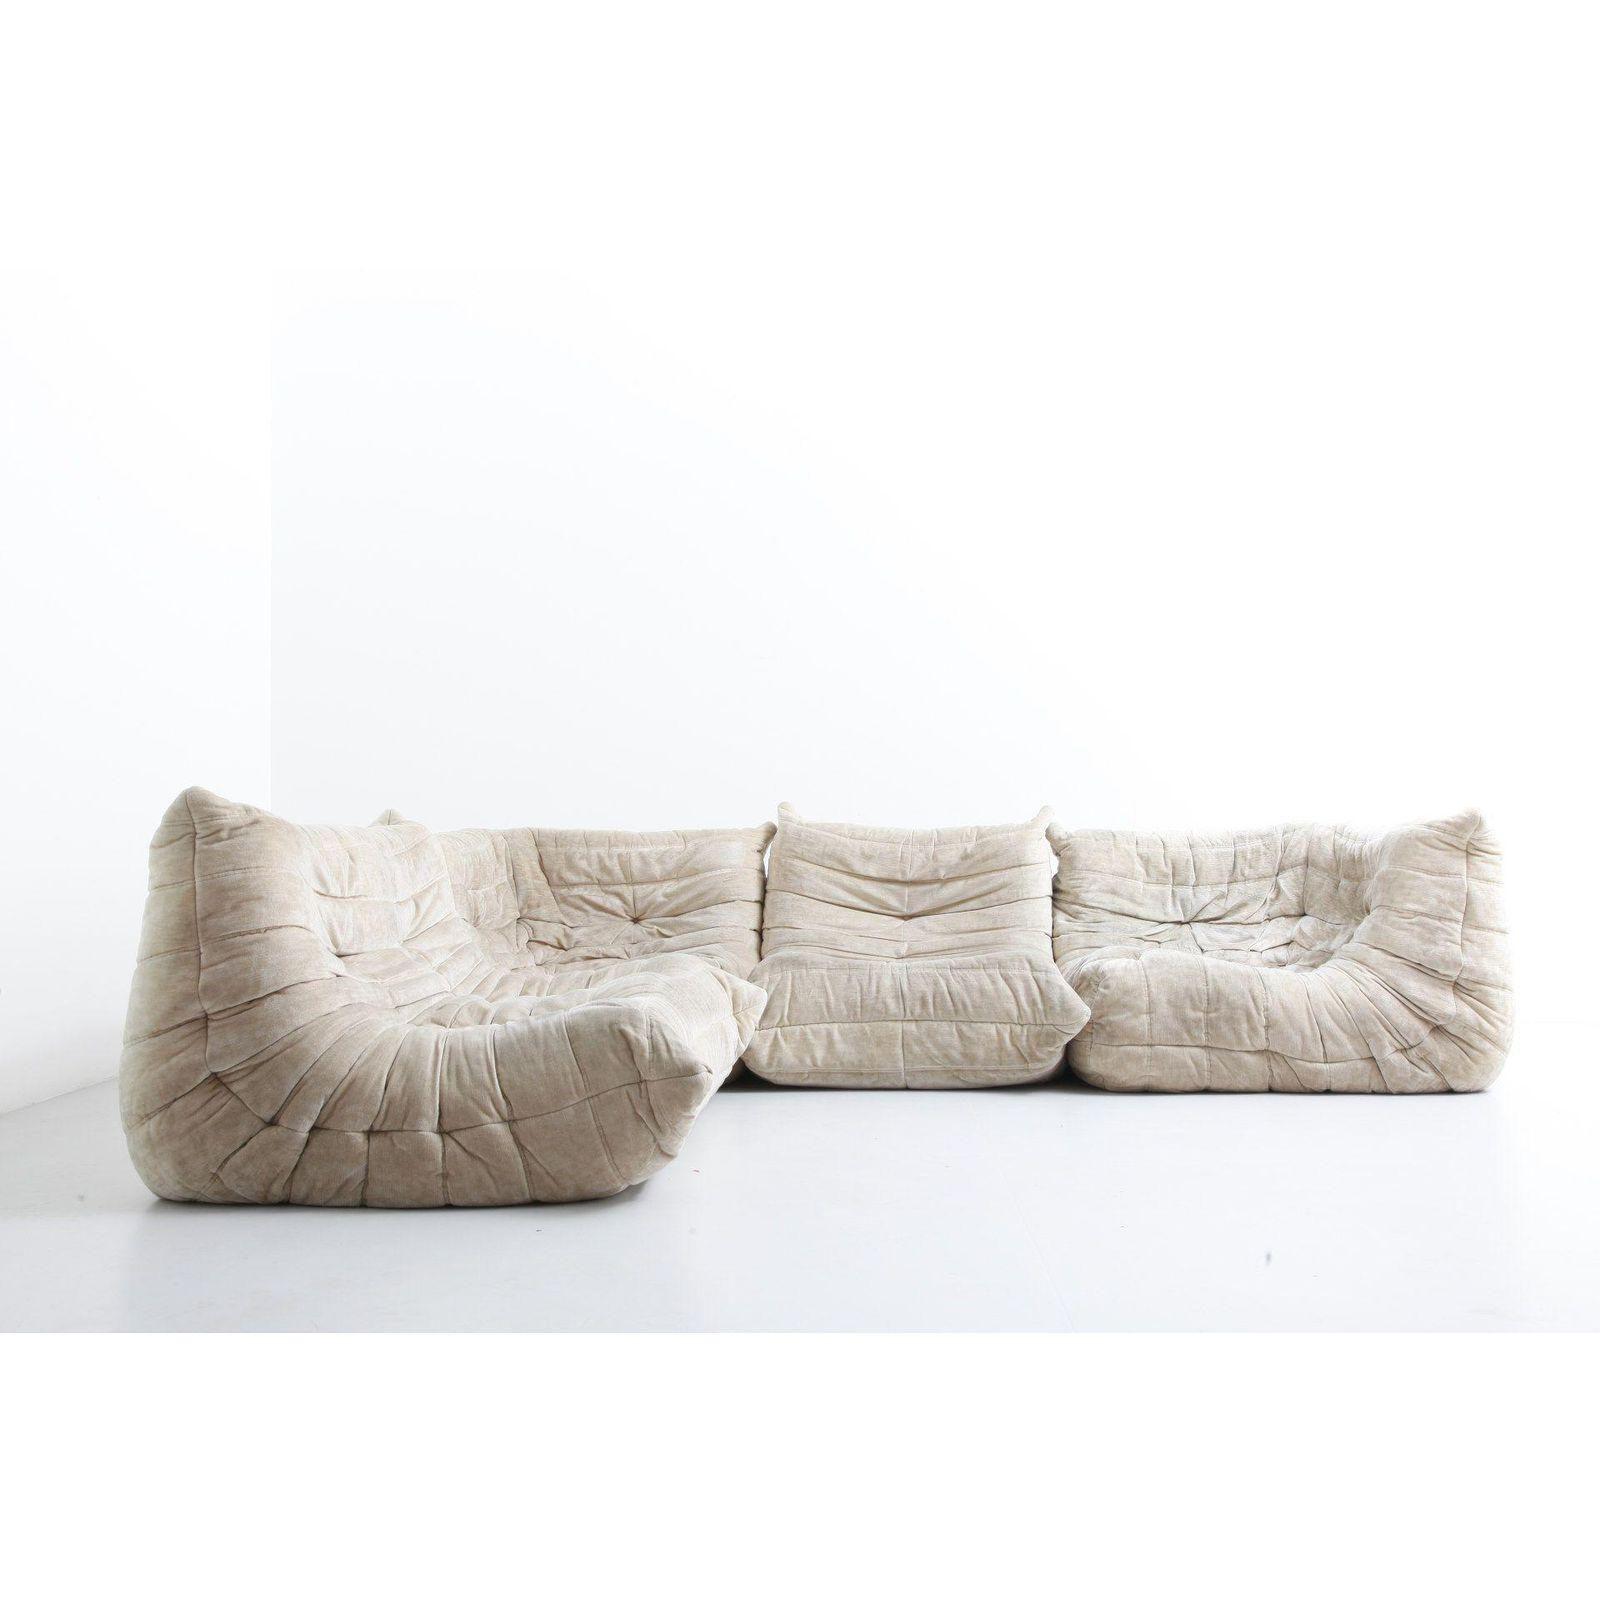 Michel Ducaroy Ligne Roset Togo Sectional Vintage Sofa Chic